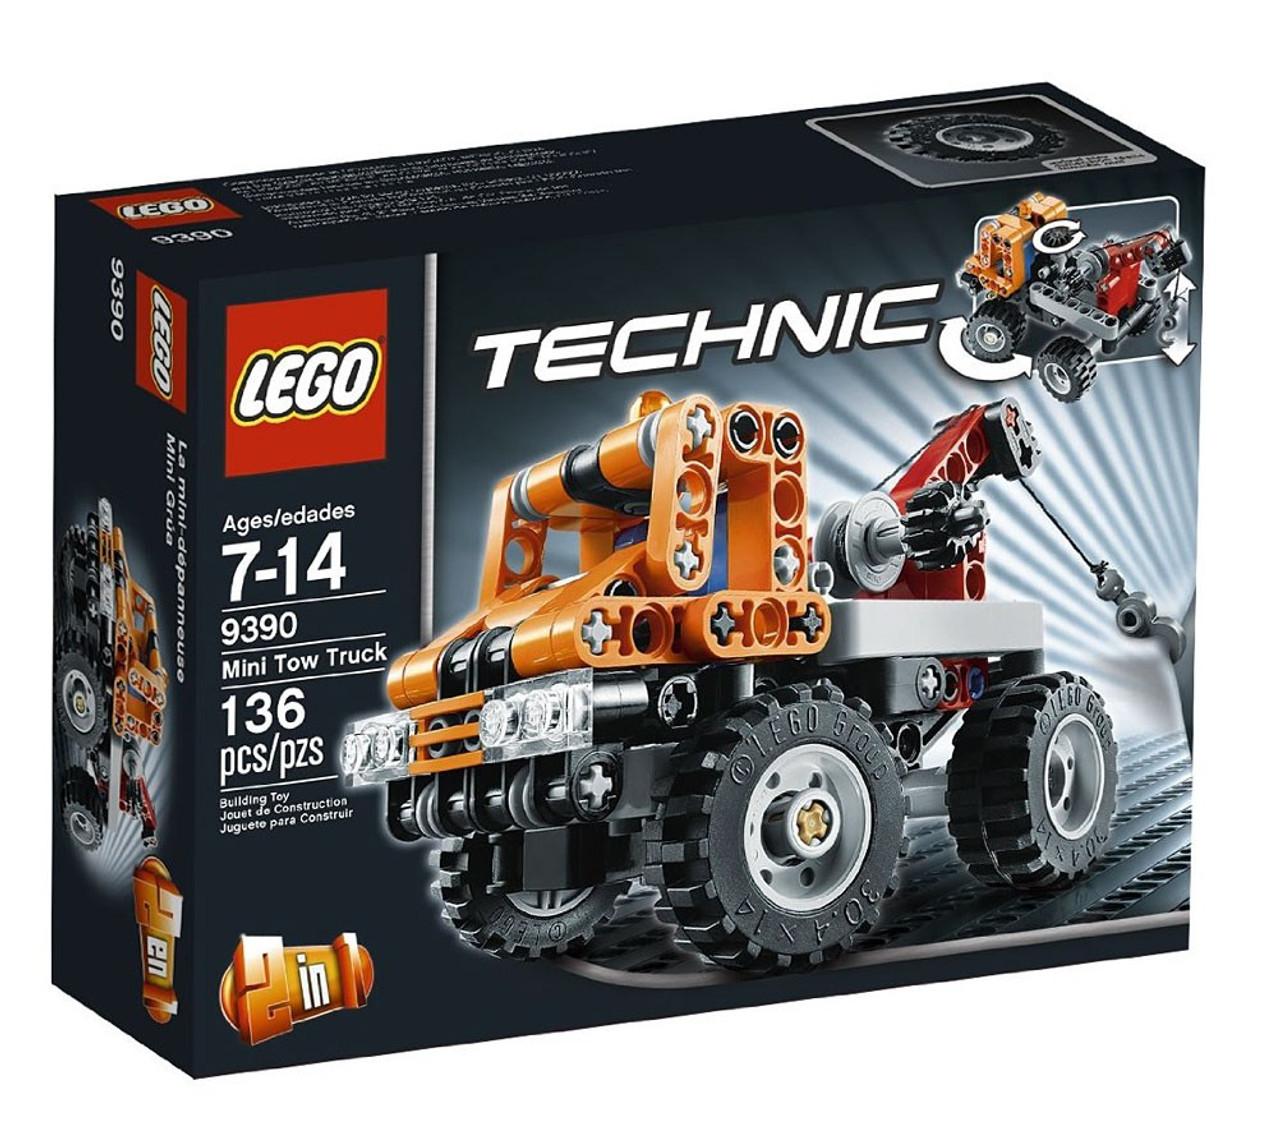 LEGO Technic Mini Tow Truck Exclusive Set #9390